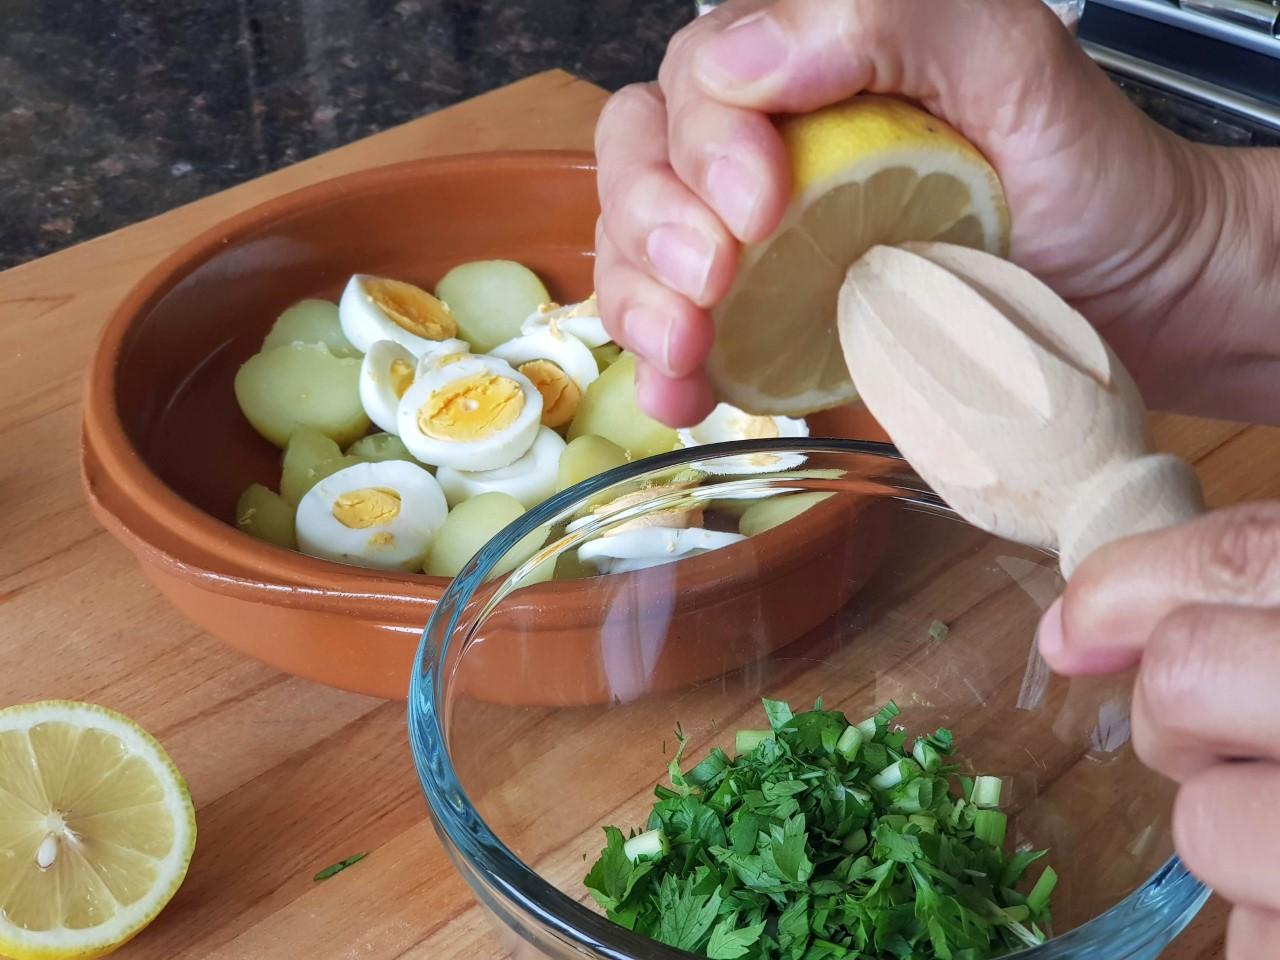 thumbnail_Lemon and herbs in a bowl.jpg